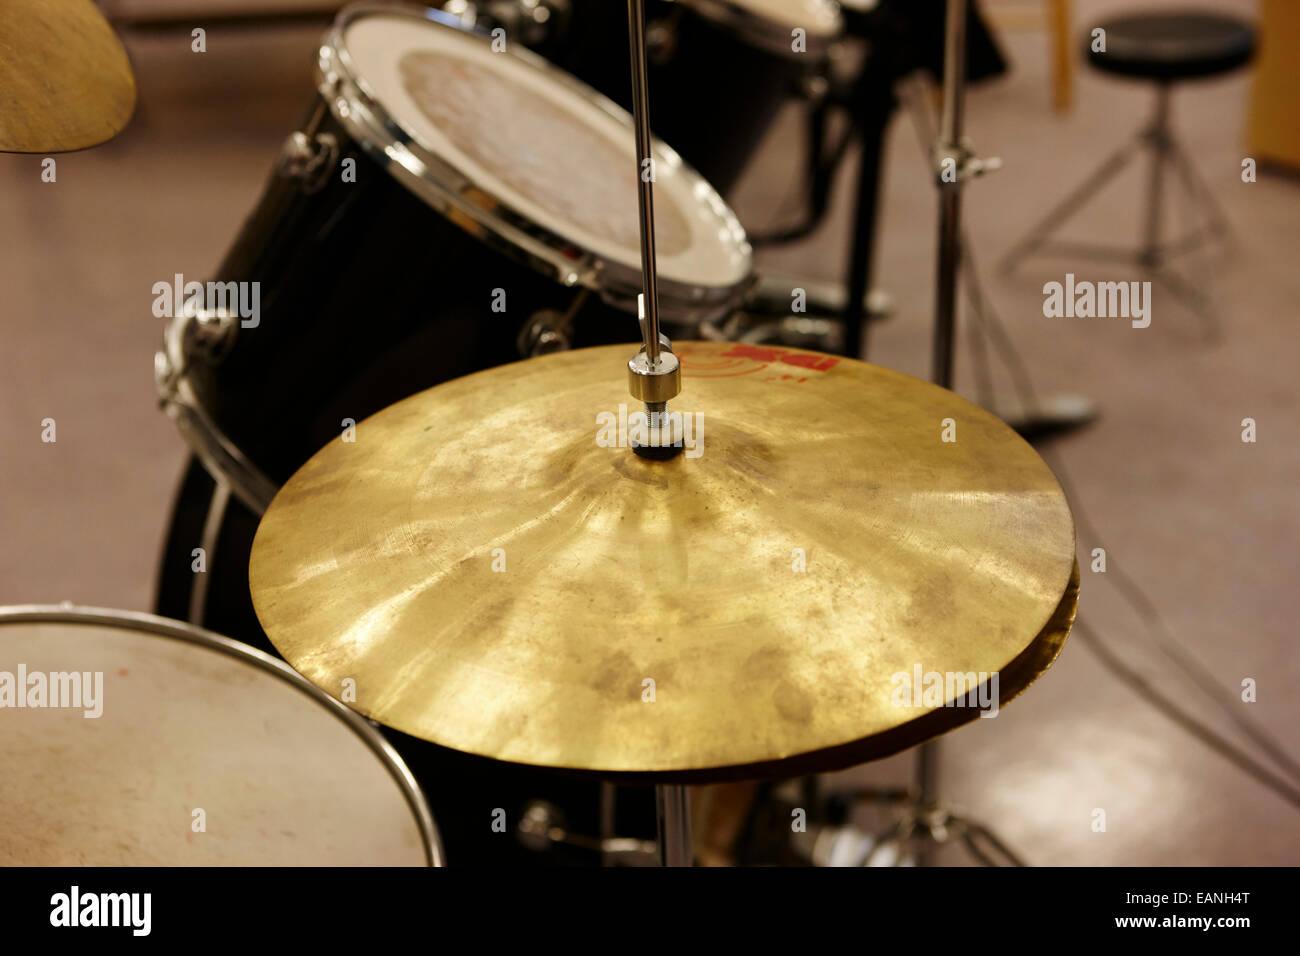 Drum Kit Stock Photos & Drum Kit Stock Images - Alamy